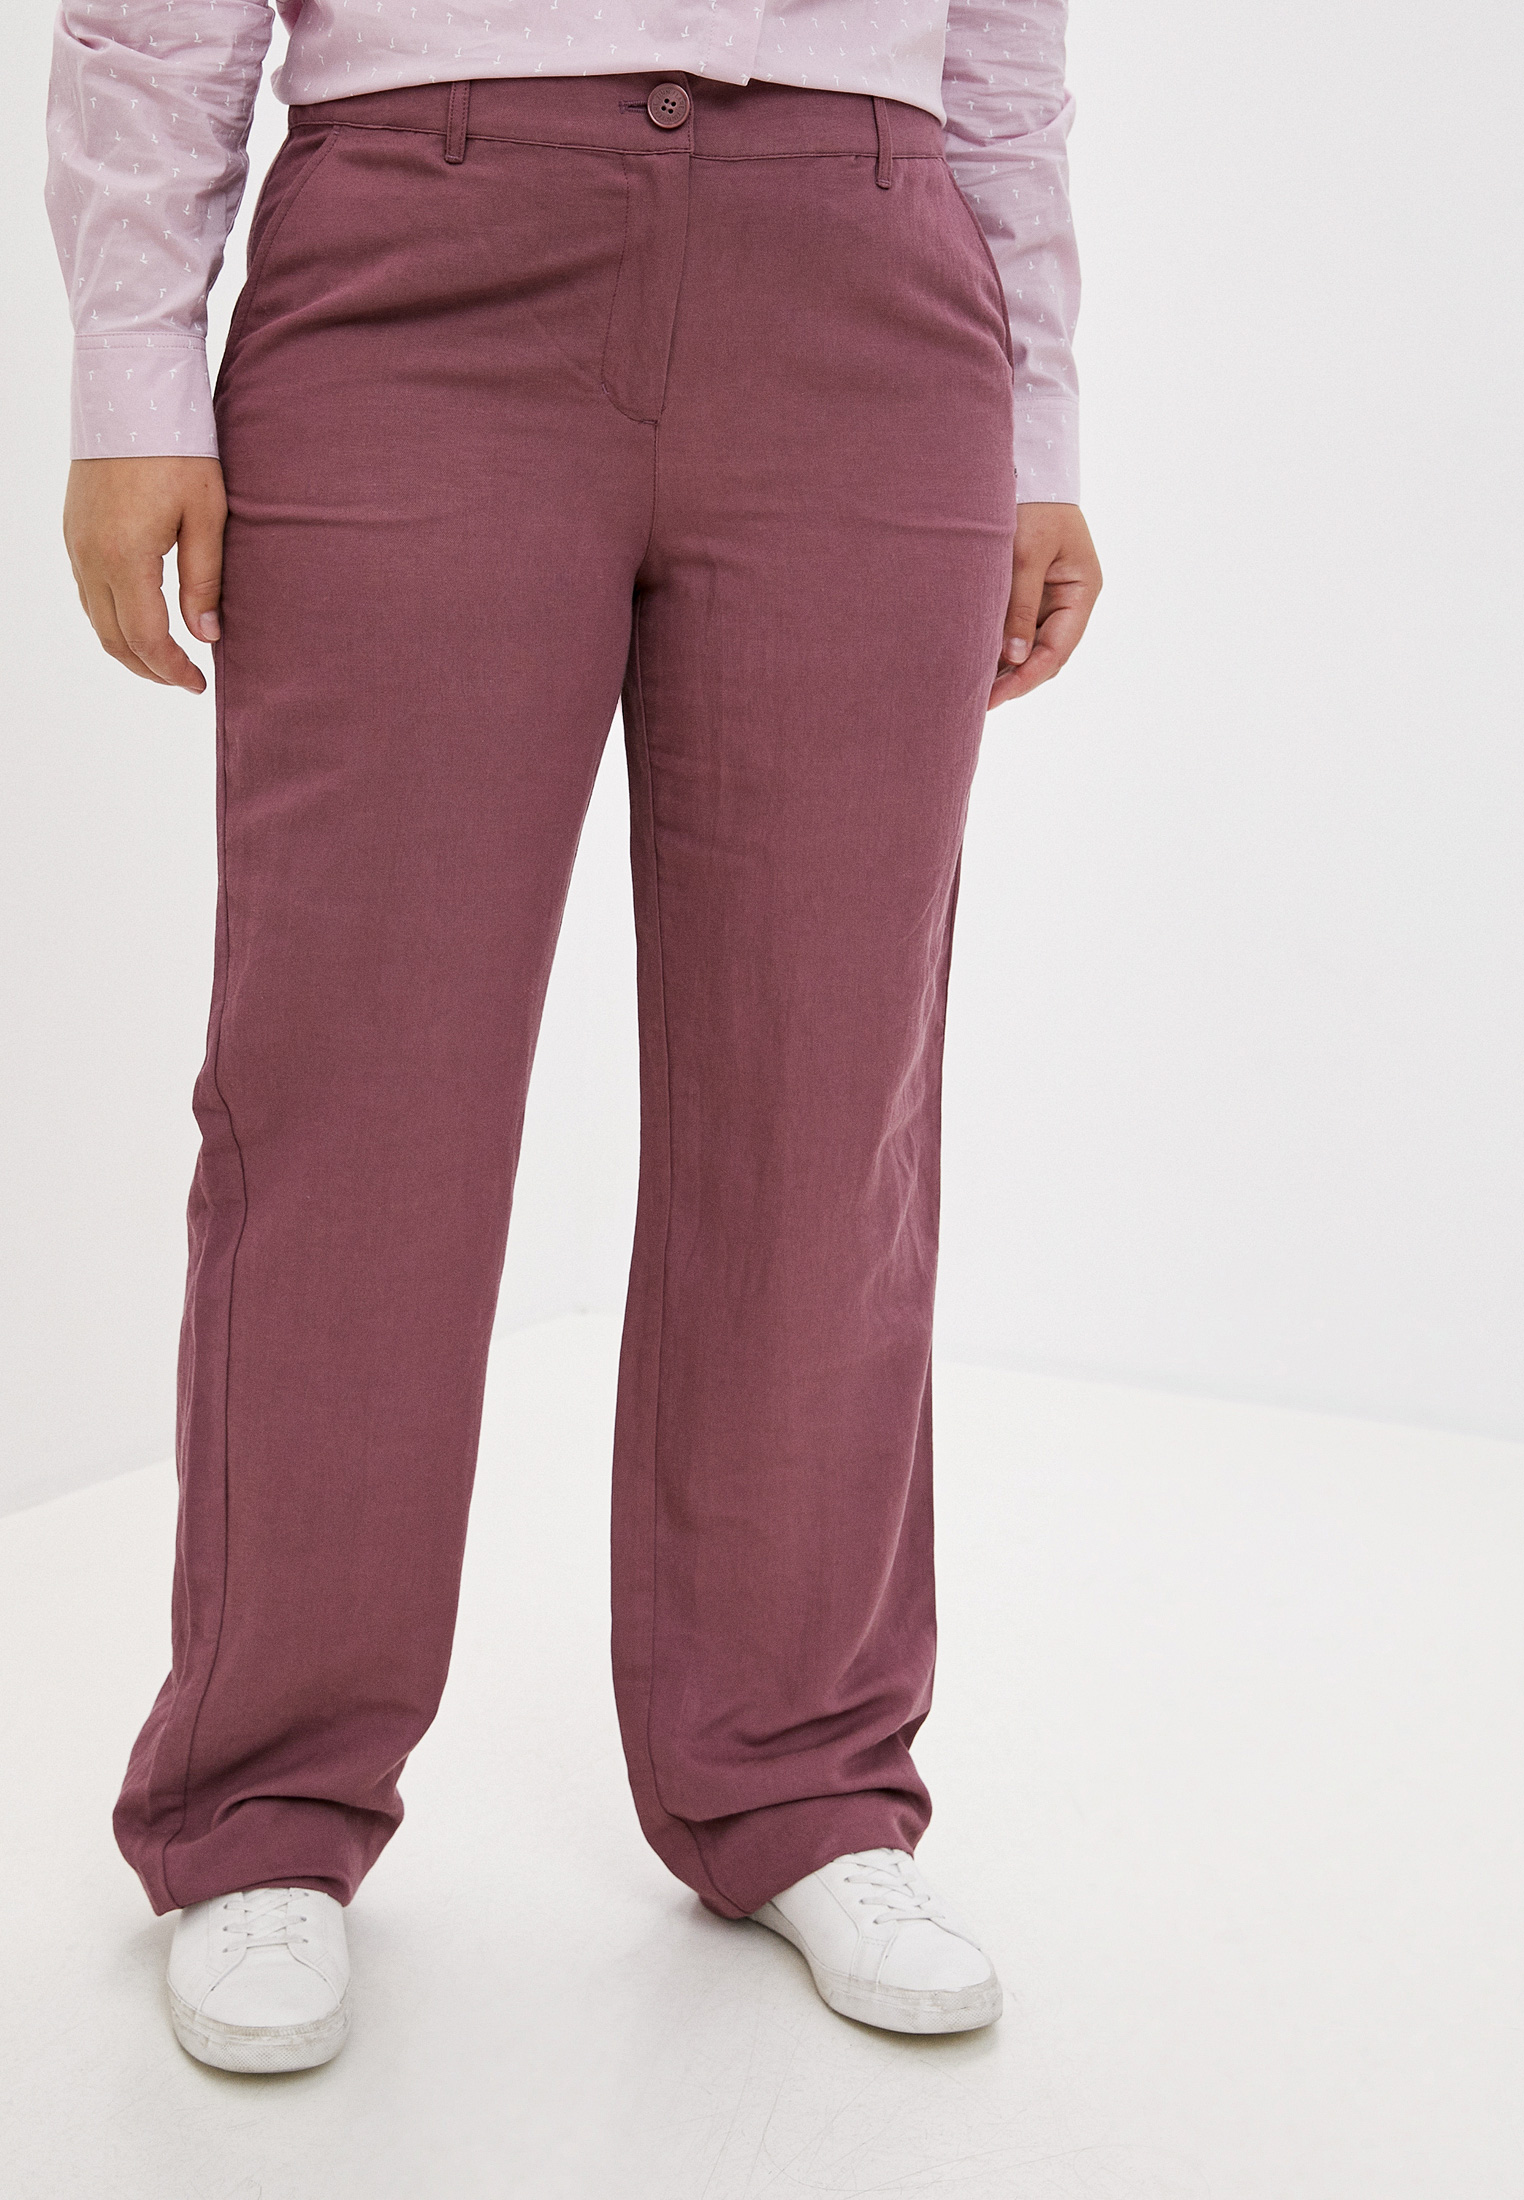 Женские прямые брюки Finn Flare (Фин Флаер) S19-11033